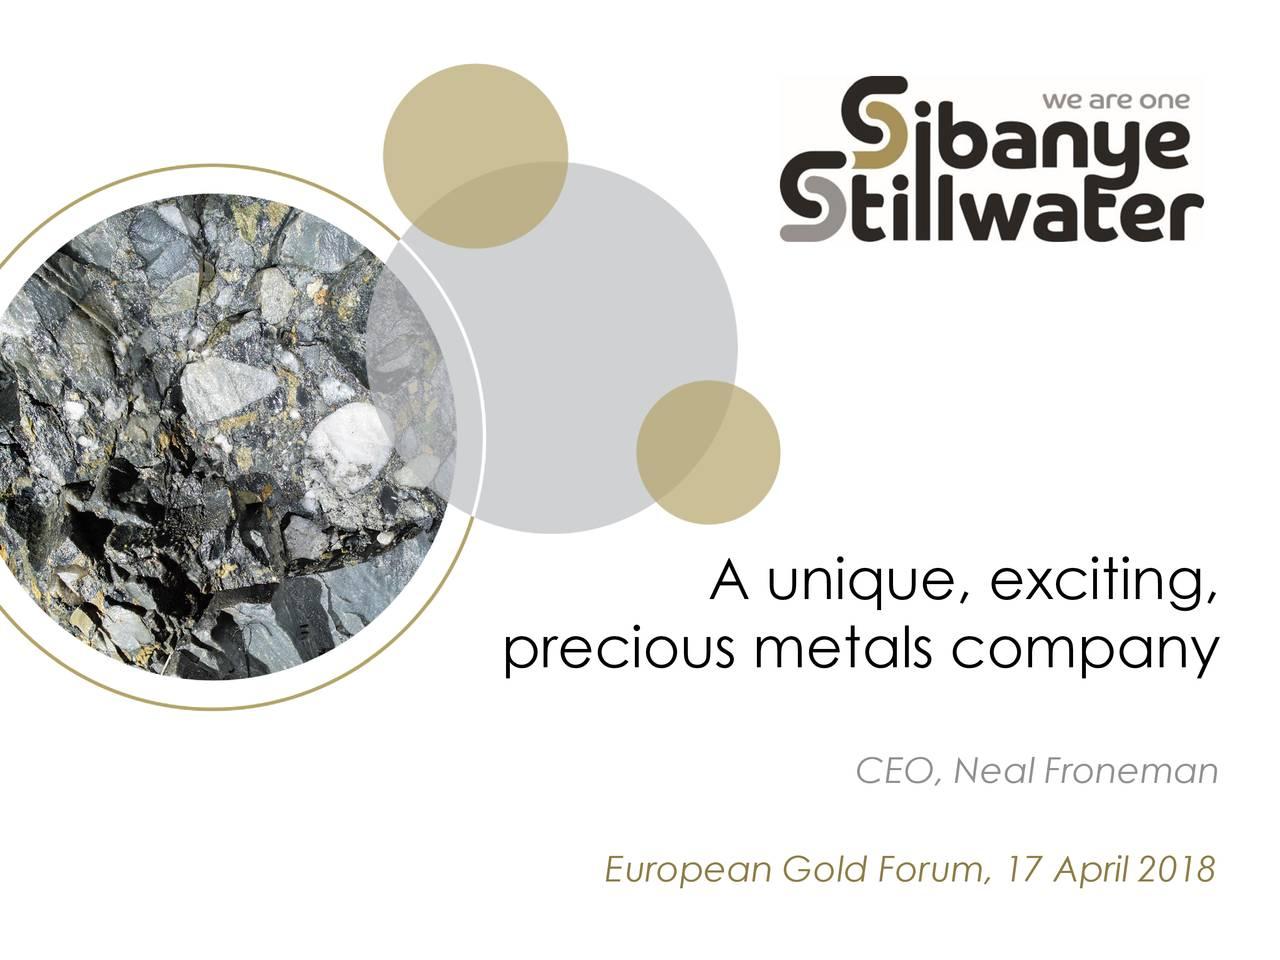 Sibanye Gold (SBGLF) Presents At European Gold Forum